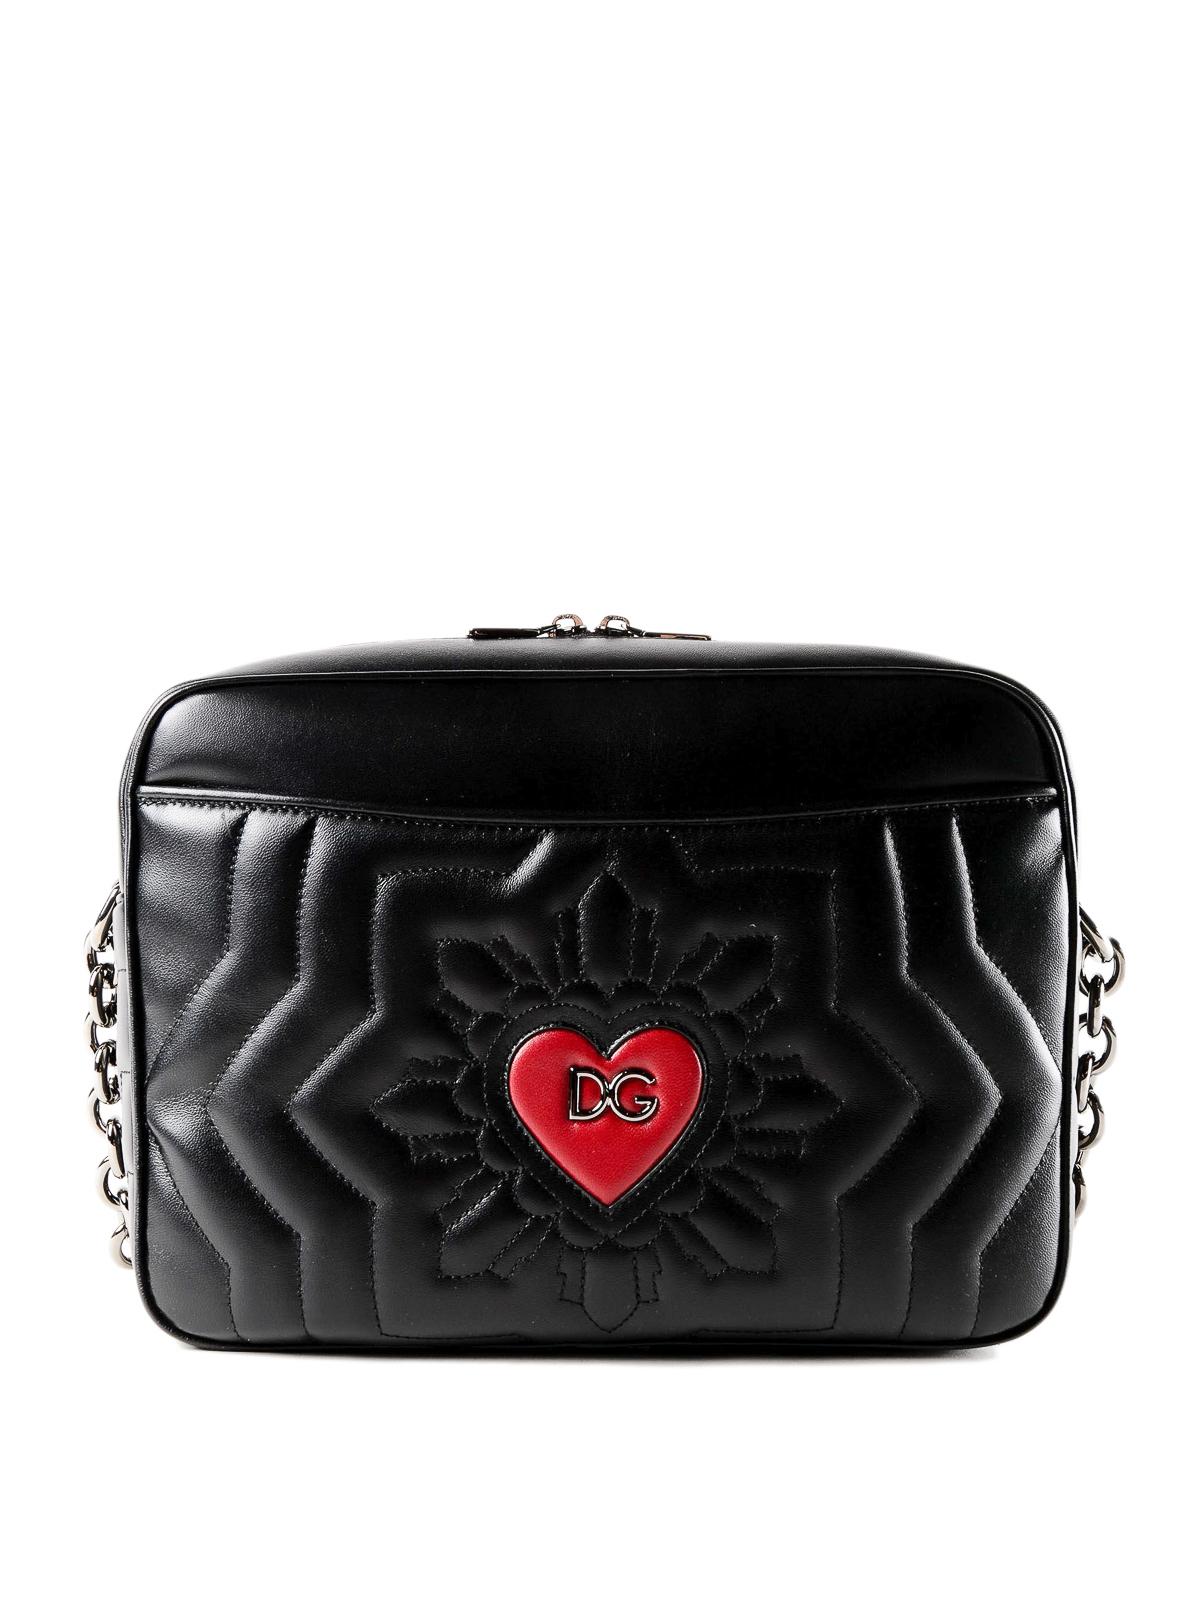 Dolce & Gabbana Logo heart matelasse leather tote kadcA9qtK